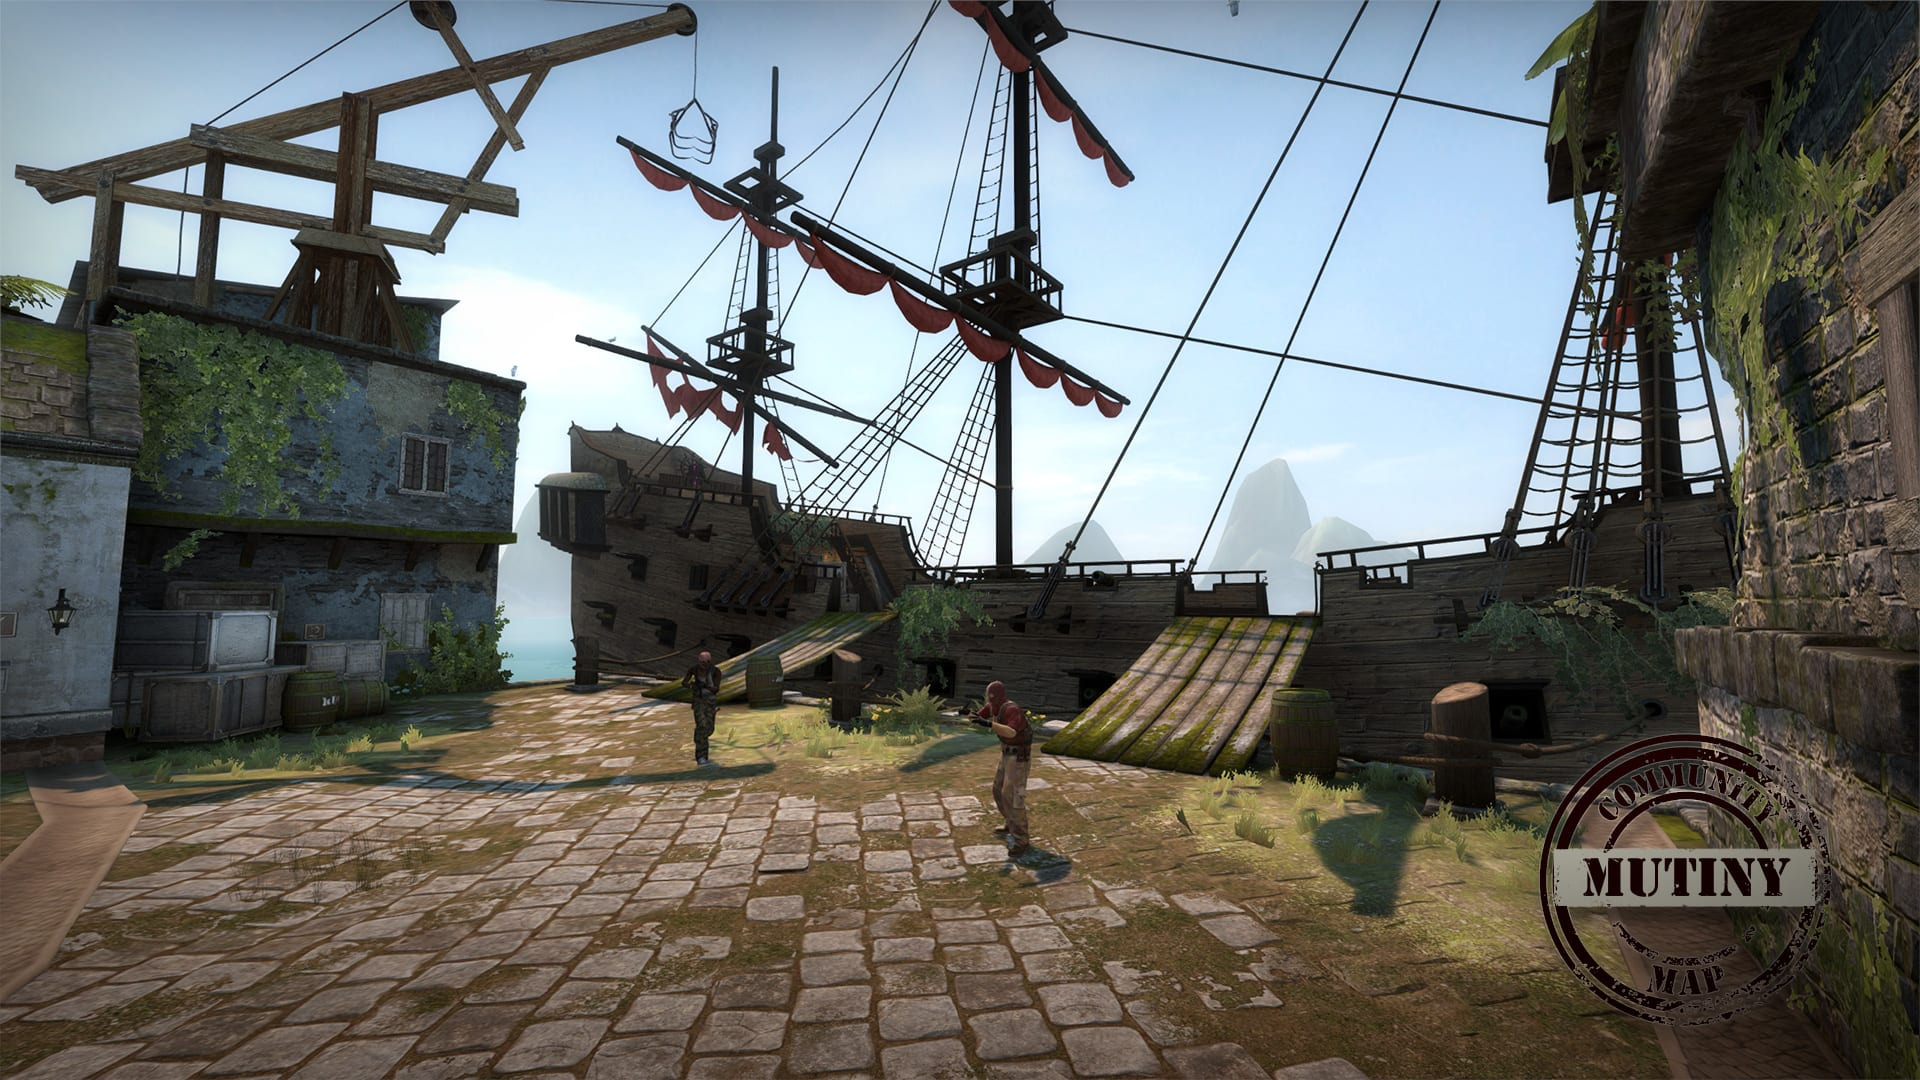 CS:GO Mutiny T Spawn